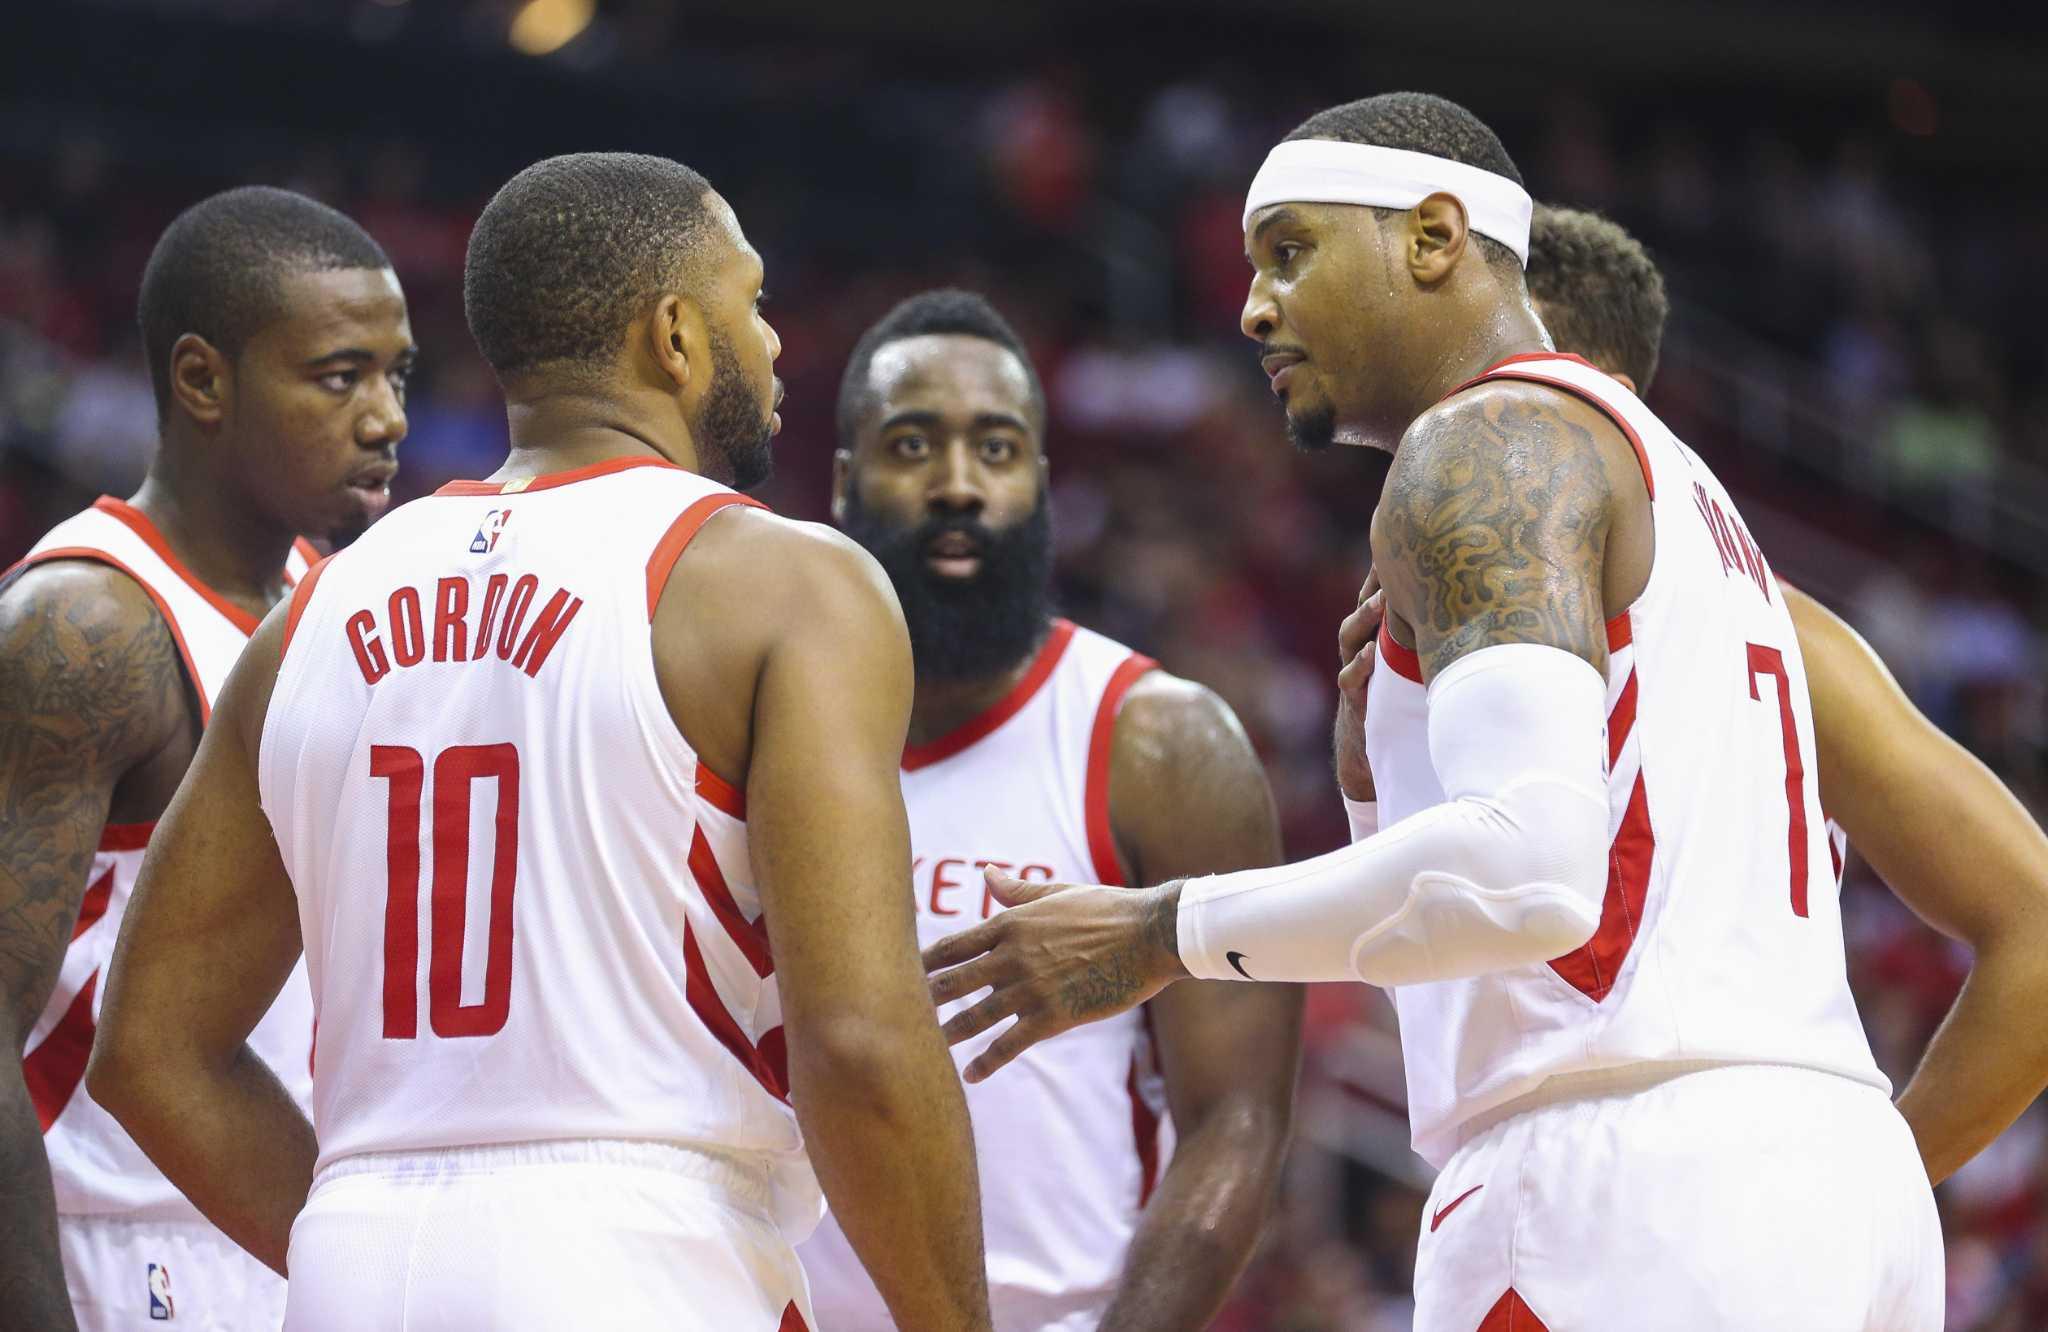 48f5a833b415 Universal goal of a championship unites Rockets - HoustonChronicle.com